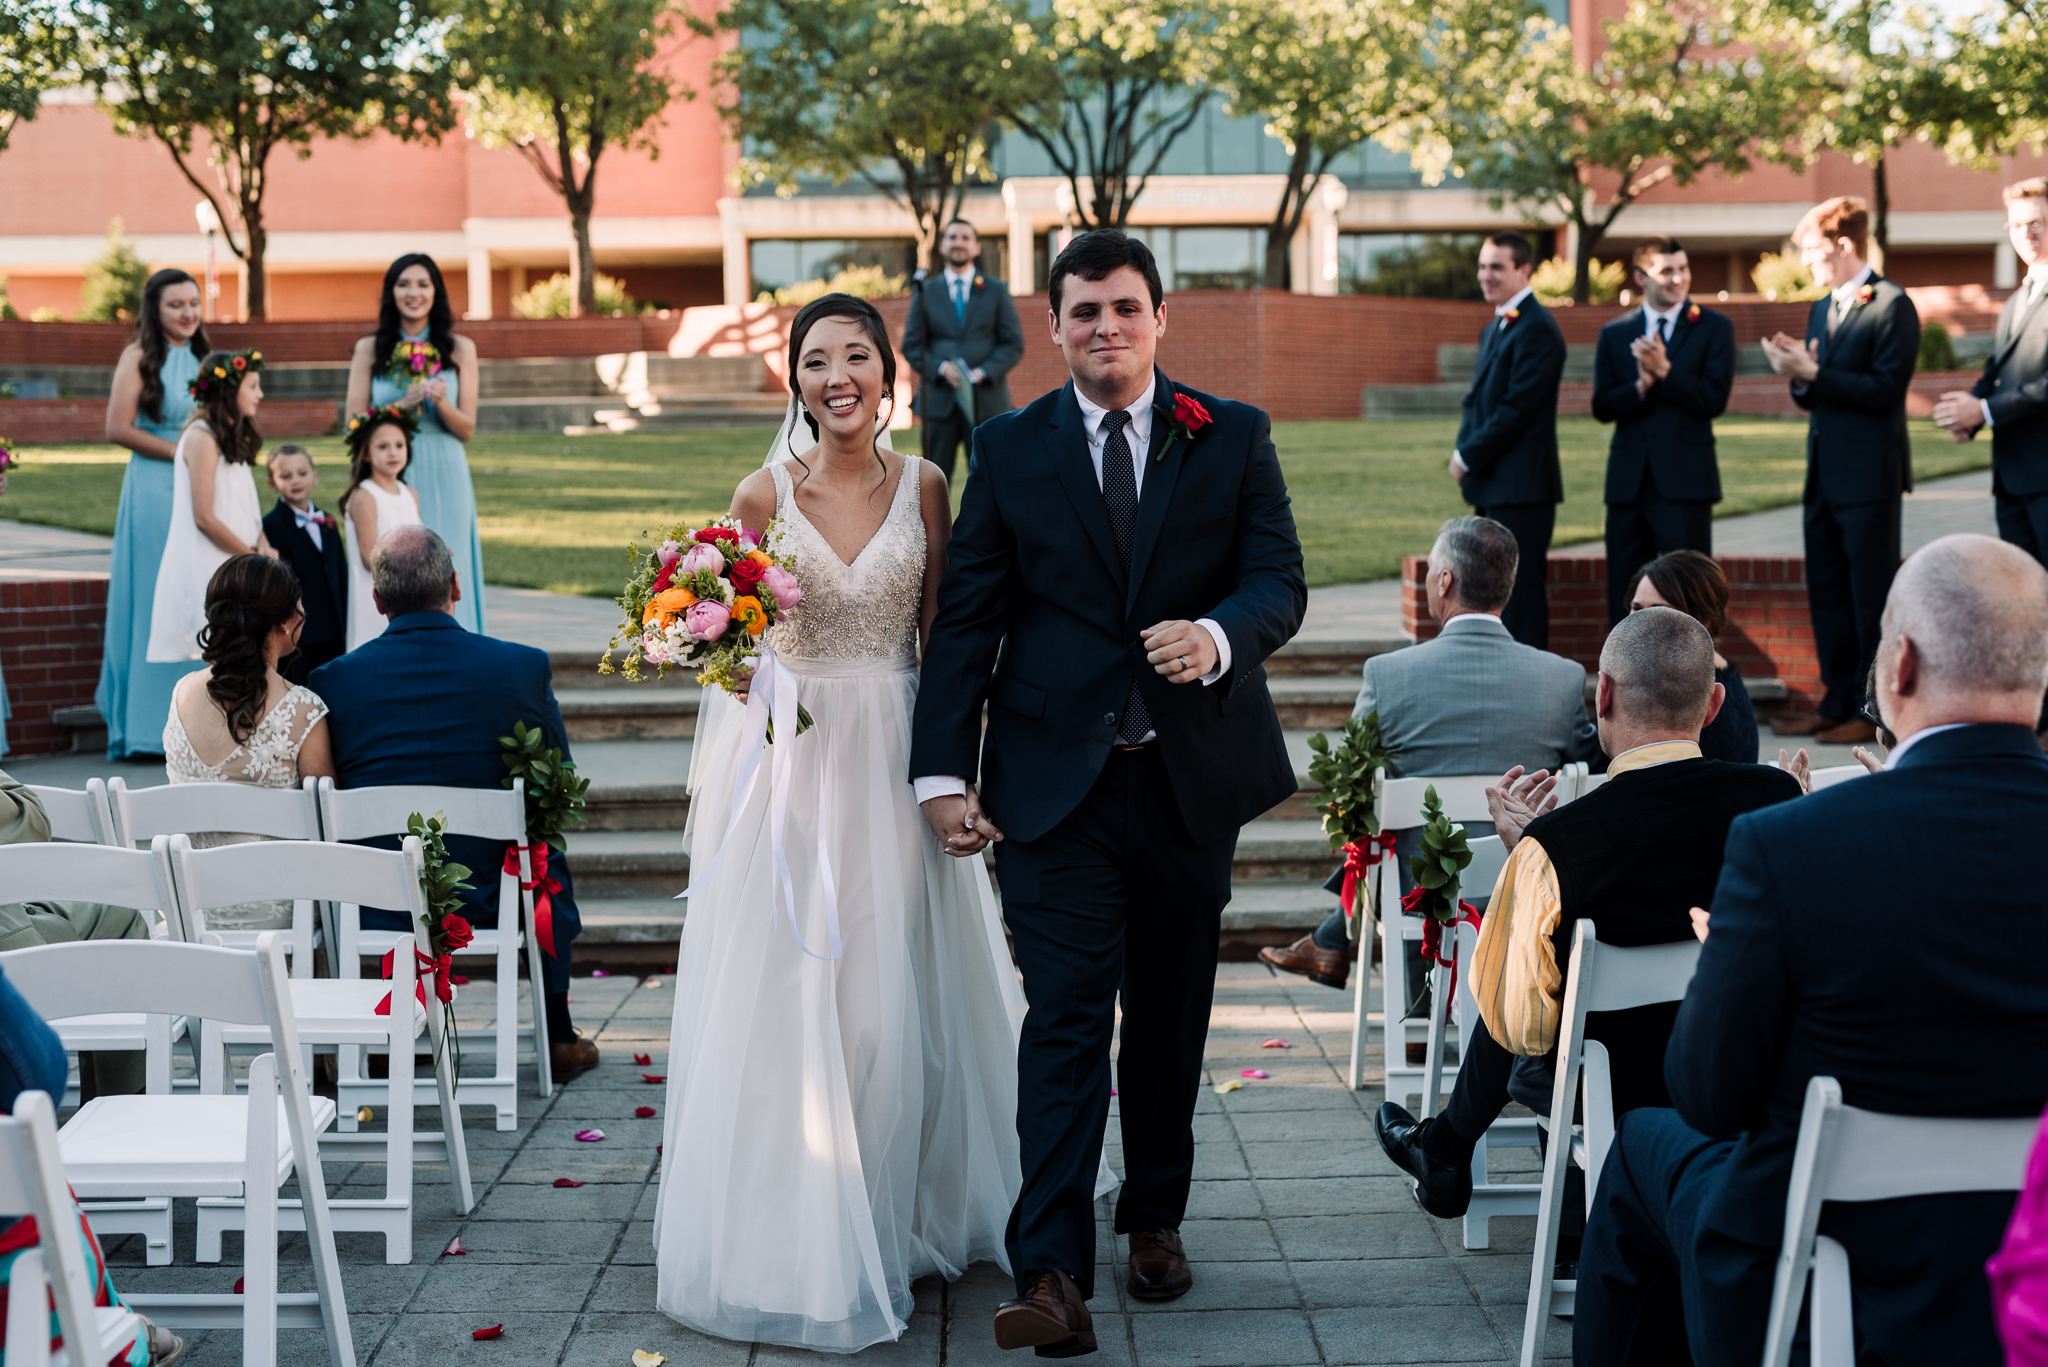 Oklahoma-Christian-University-Wedding-8289.jpg